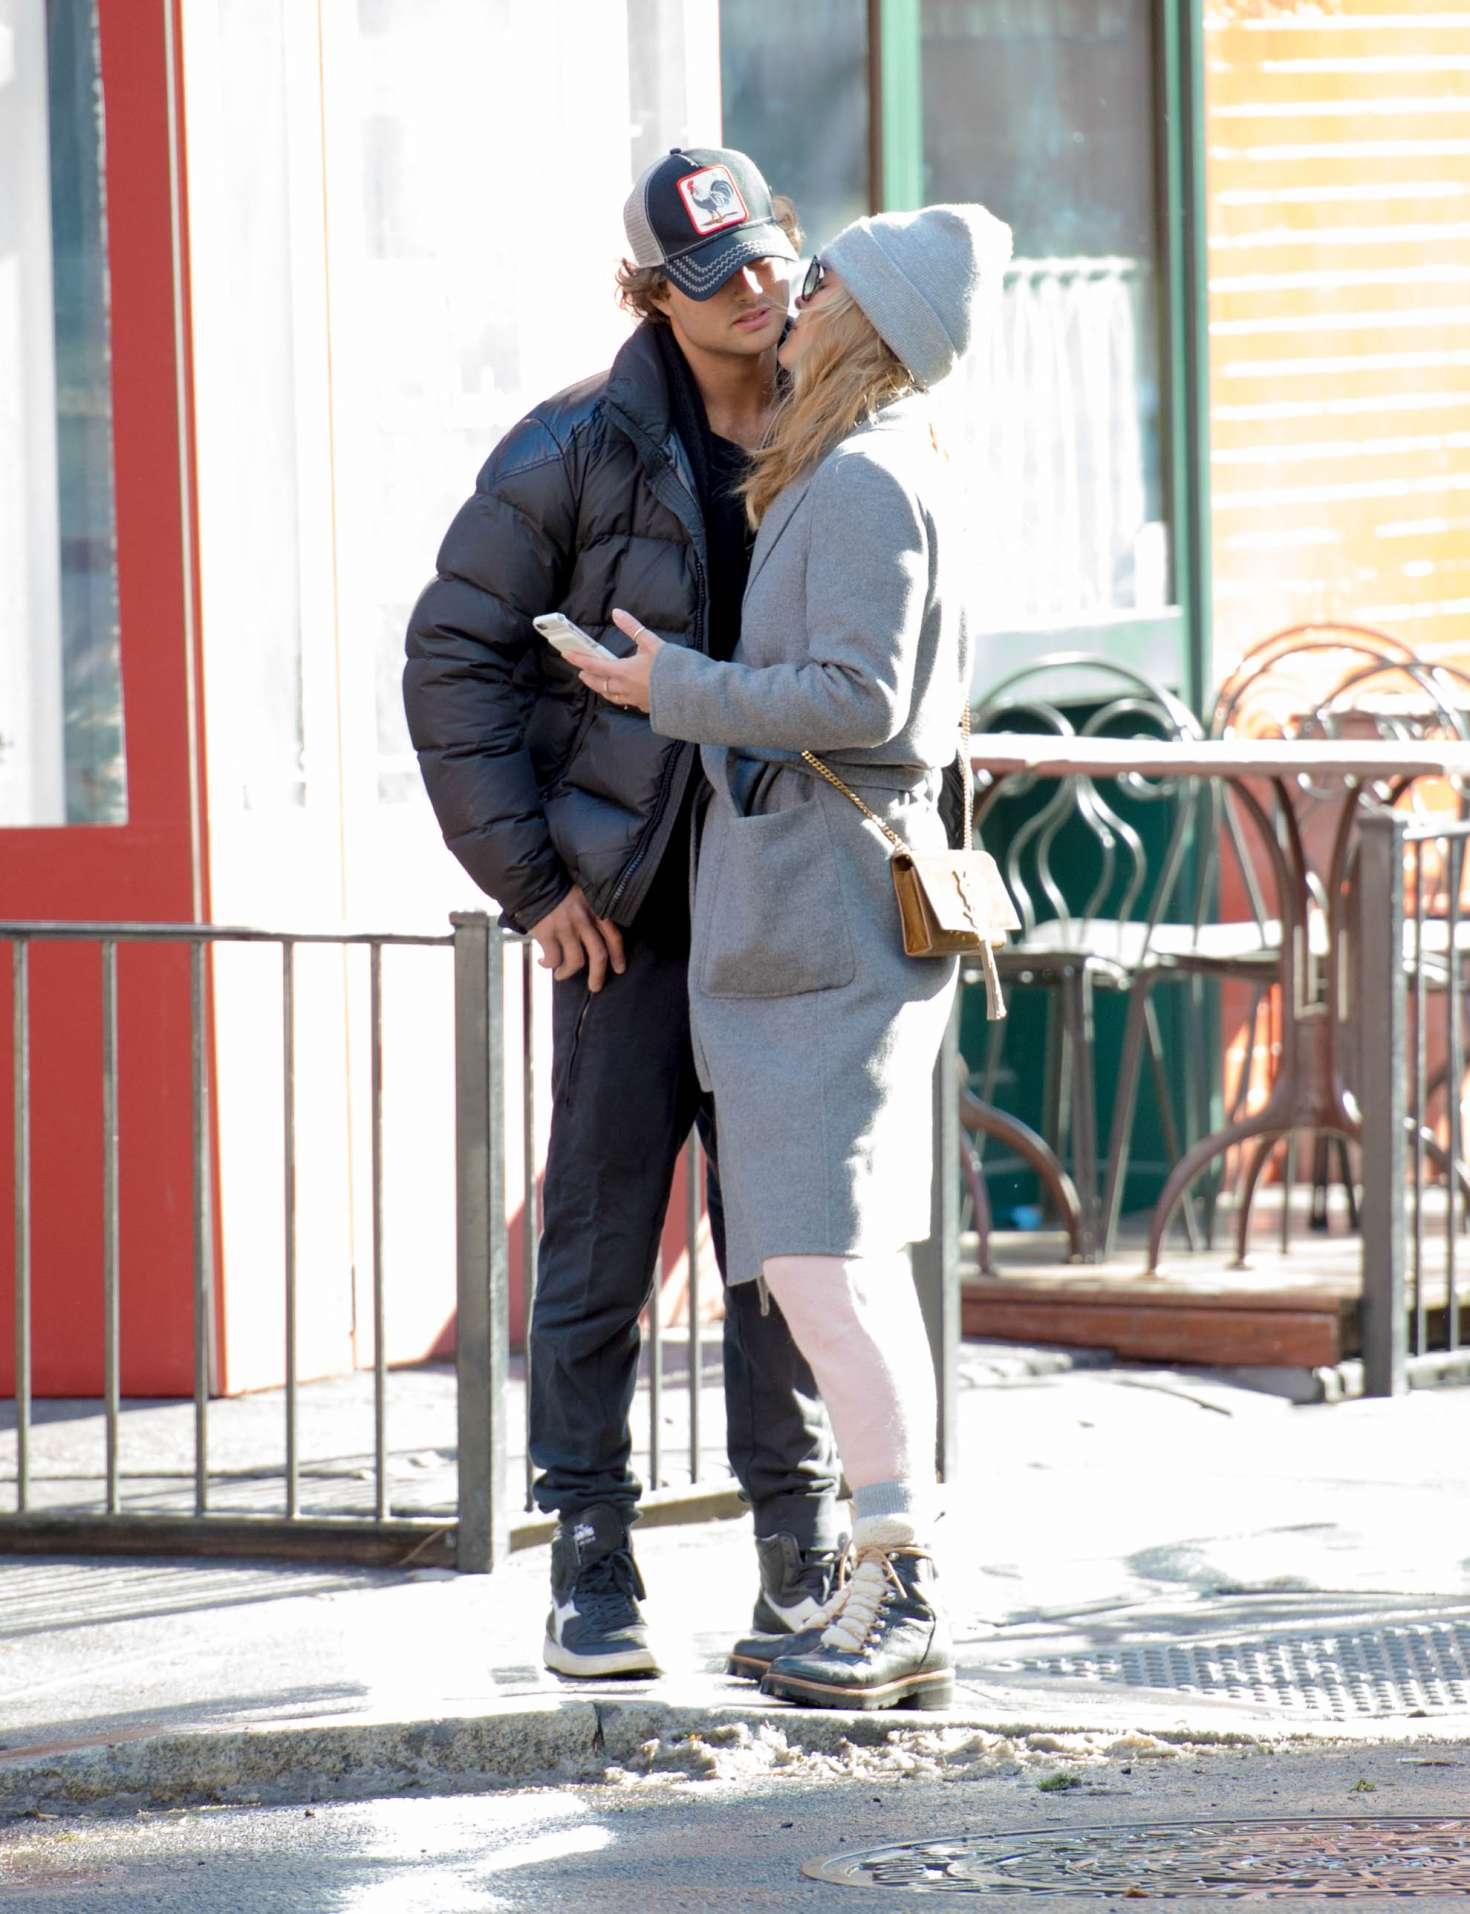 Nina Agdal 2018 : Nina Agdal: Shopping with boyfriend Jack Brinkley-Cook -13